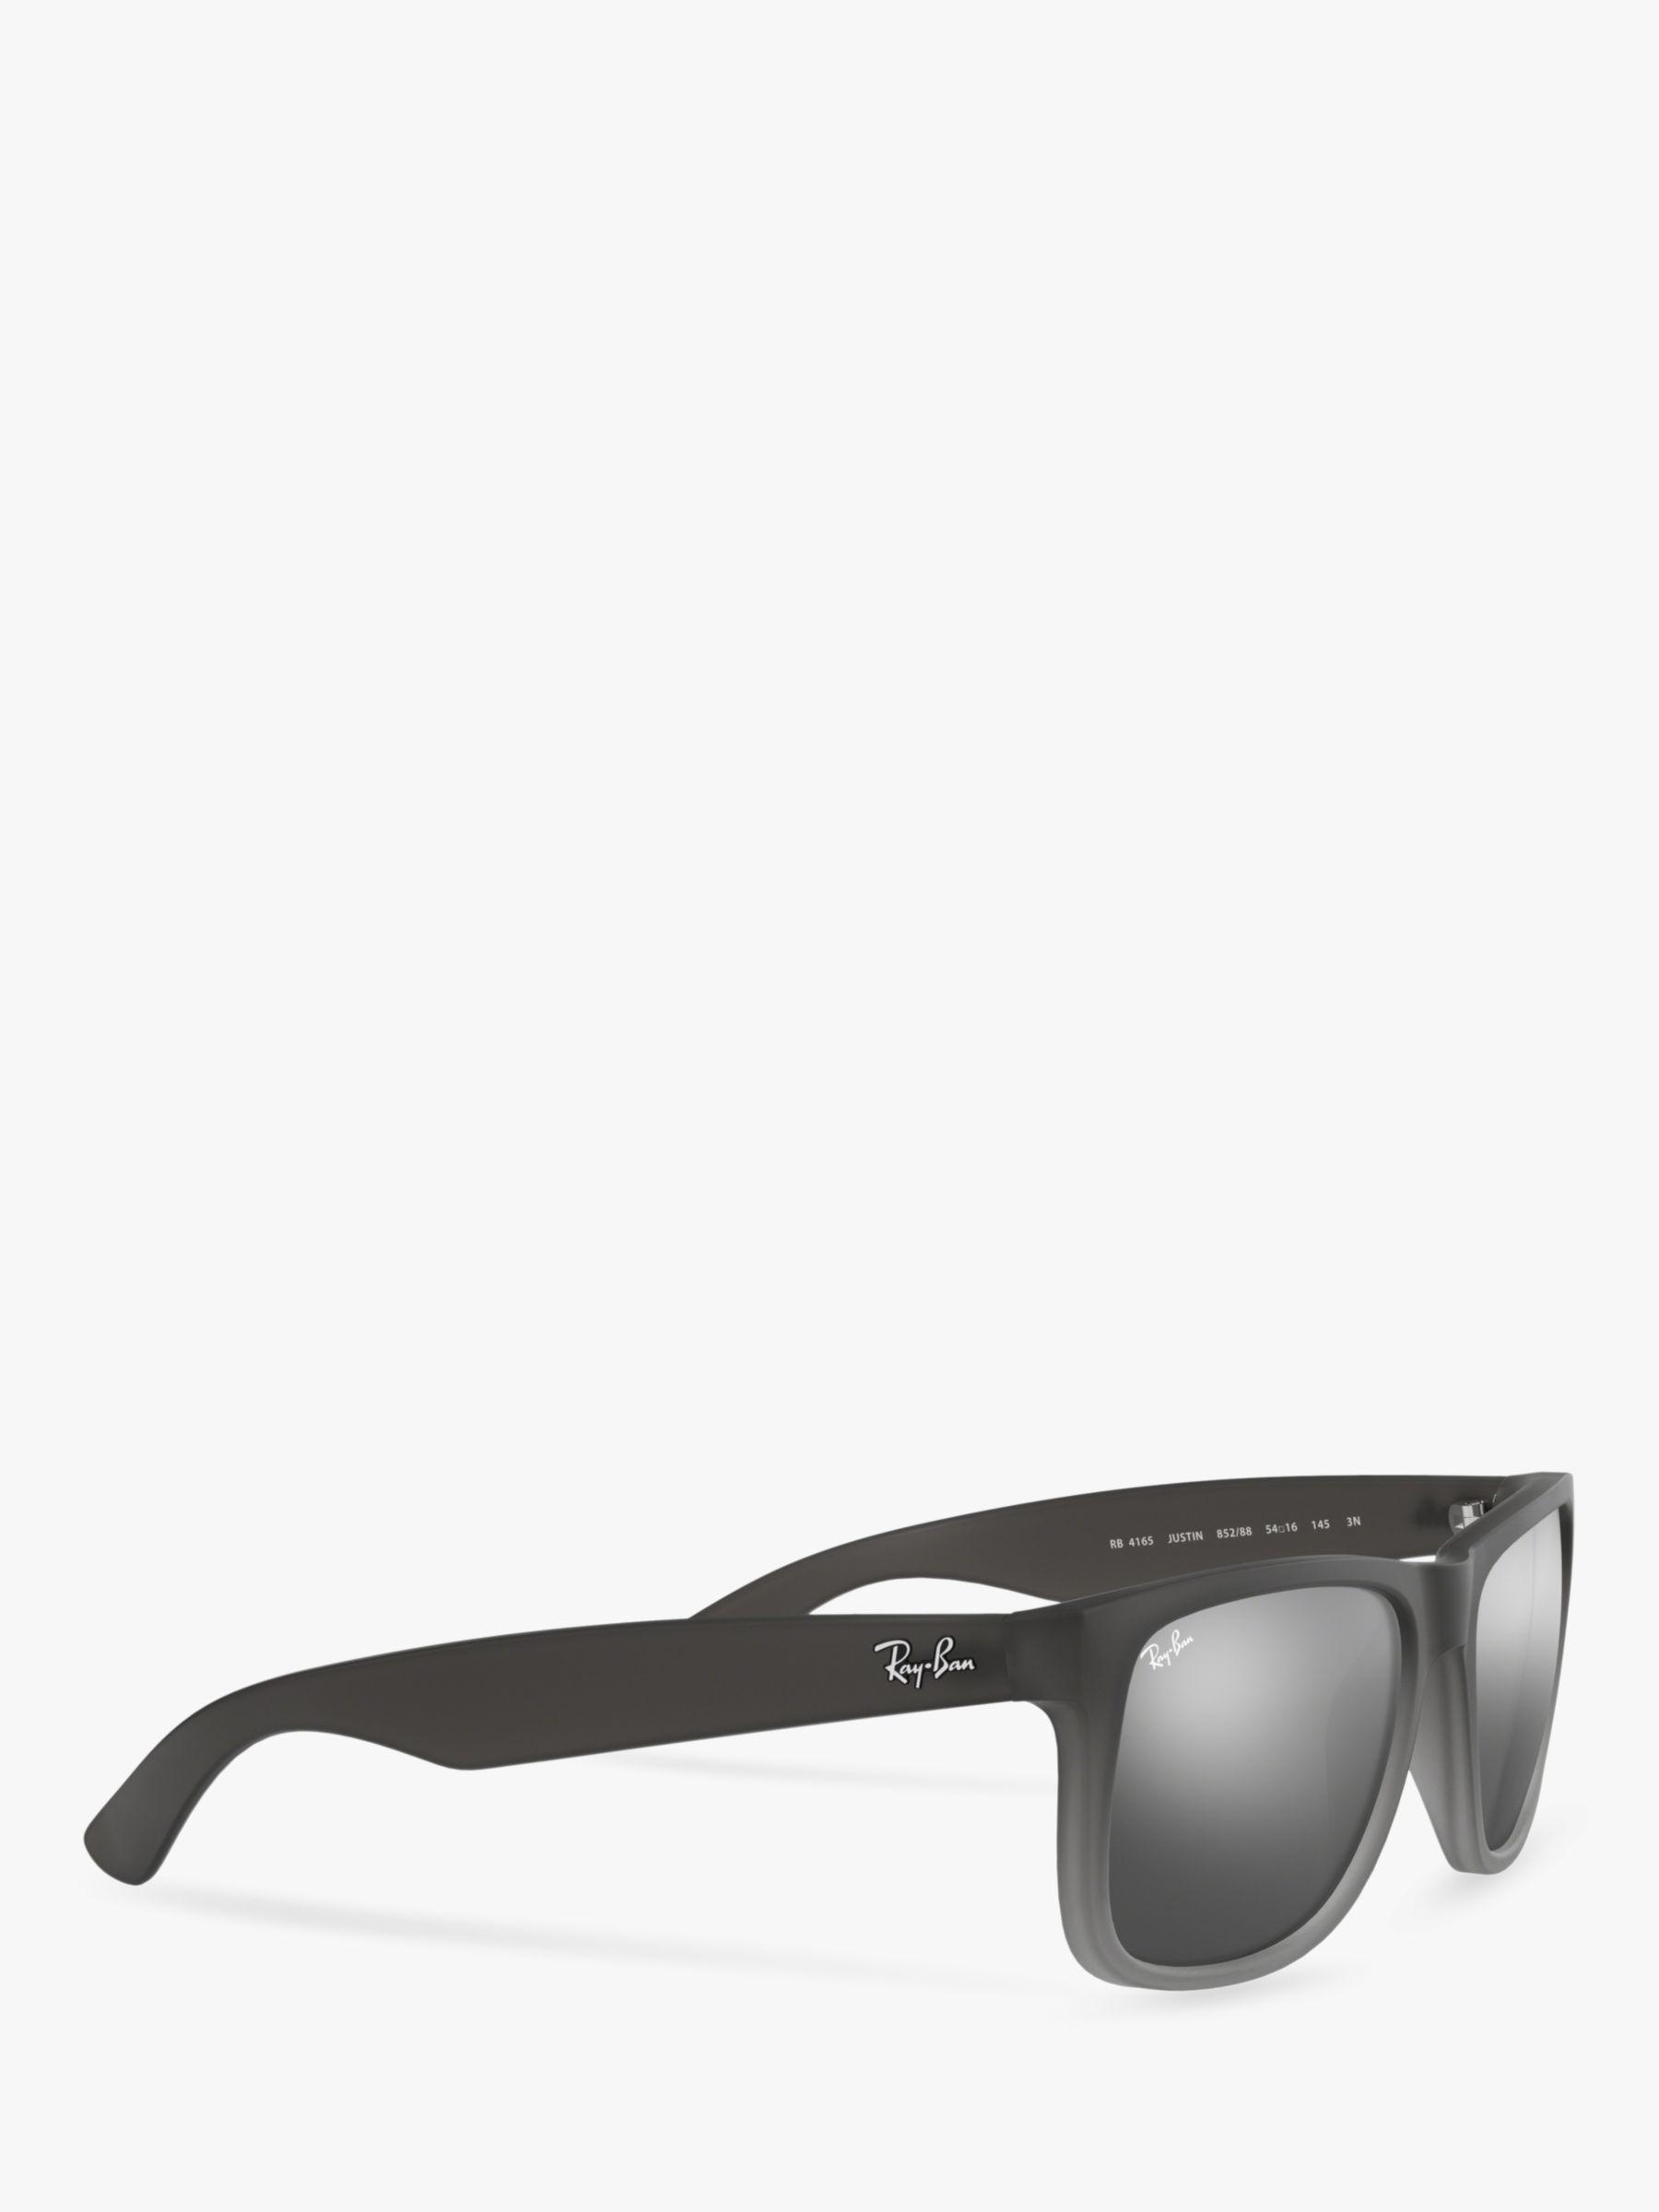 6a38e1284d Ray-Ban Rb4165 Men s Justin Rectangular Sunglasses in Gray for Men ...